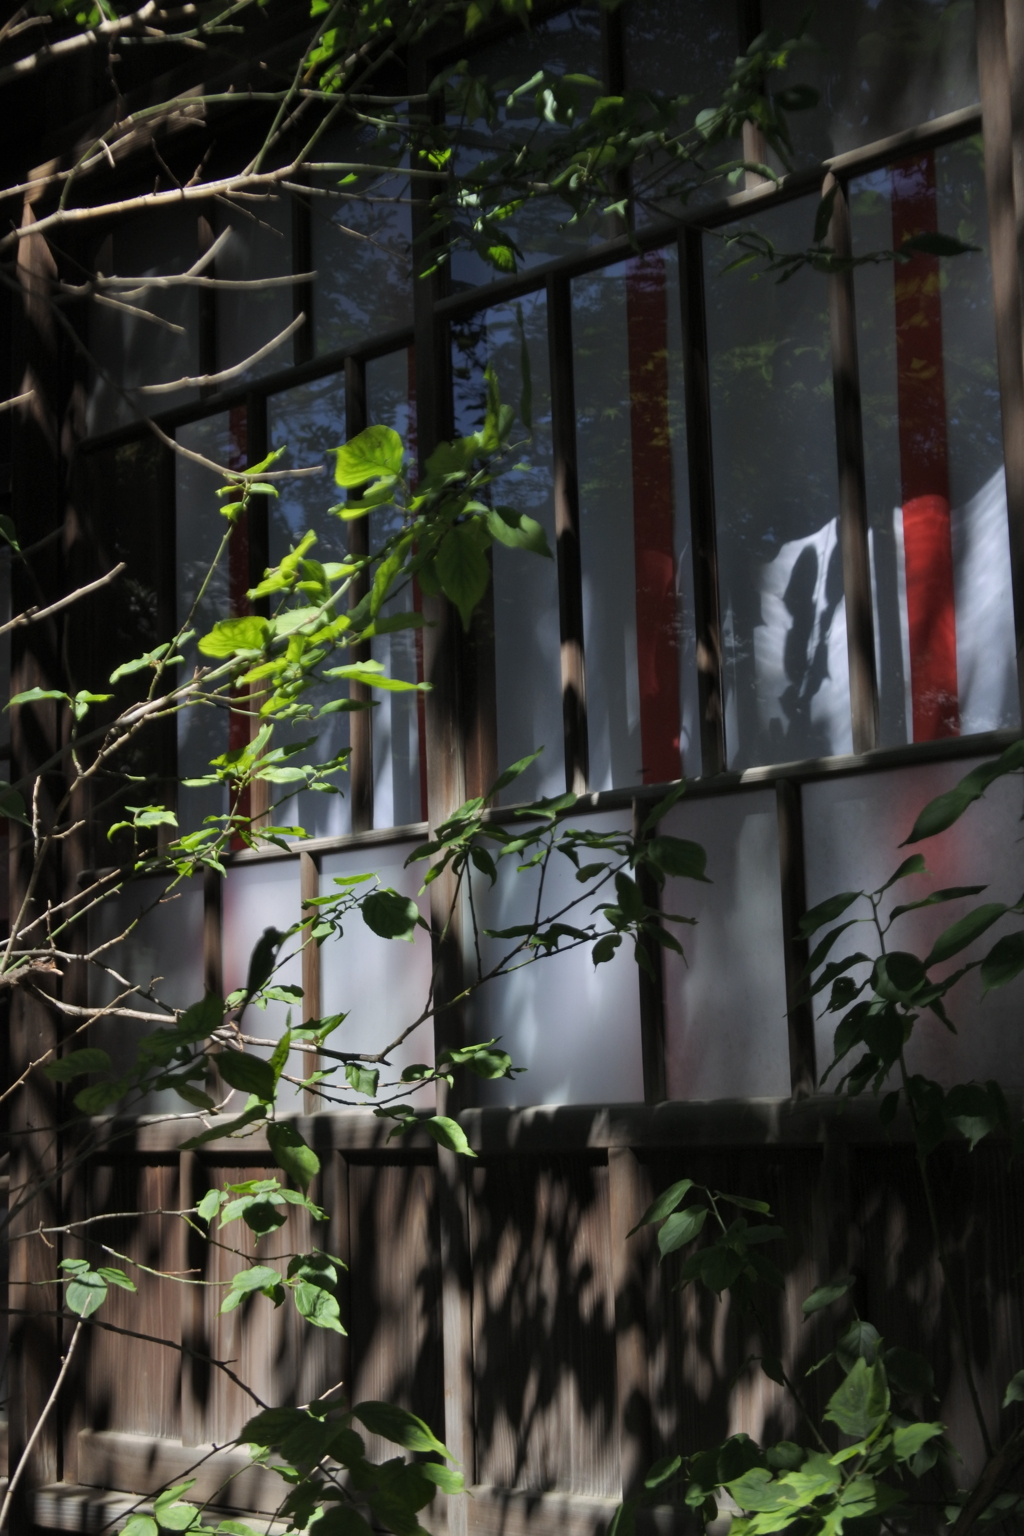 七社神社 社殿の廊下